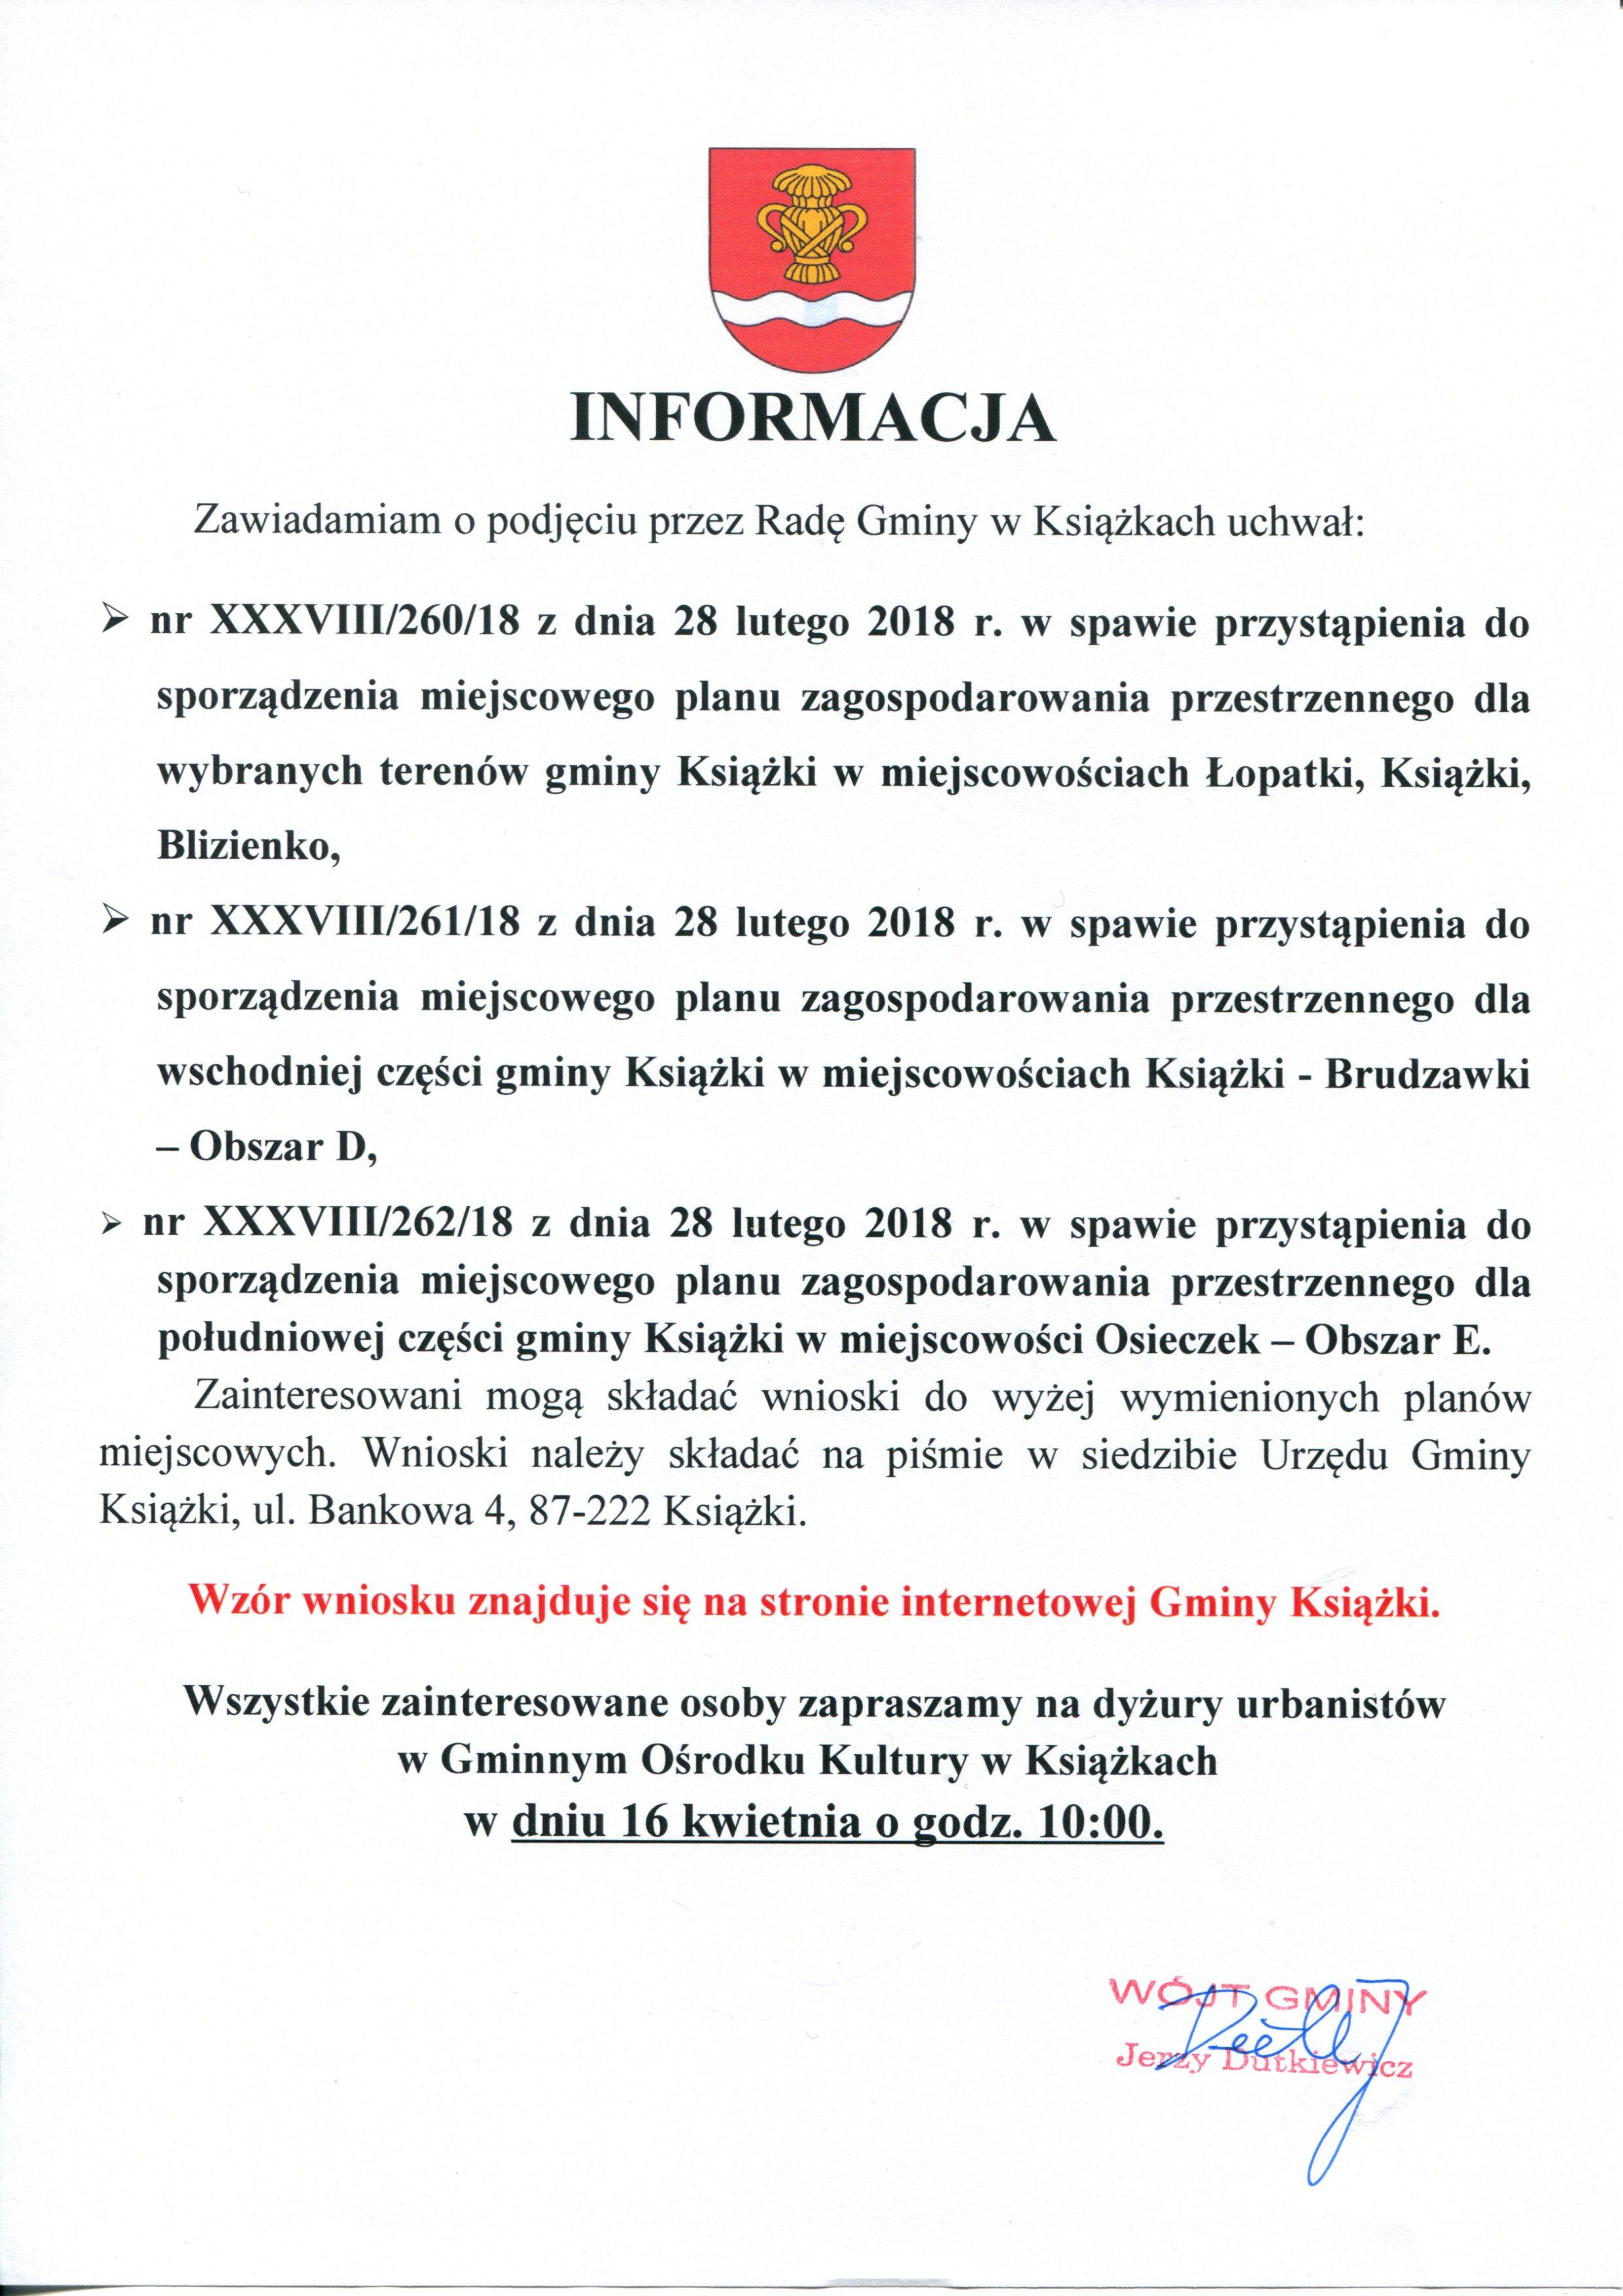 img302